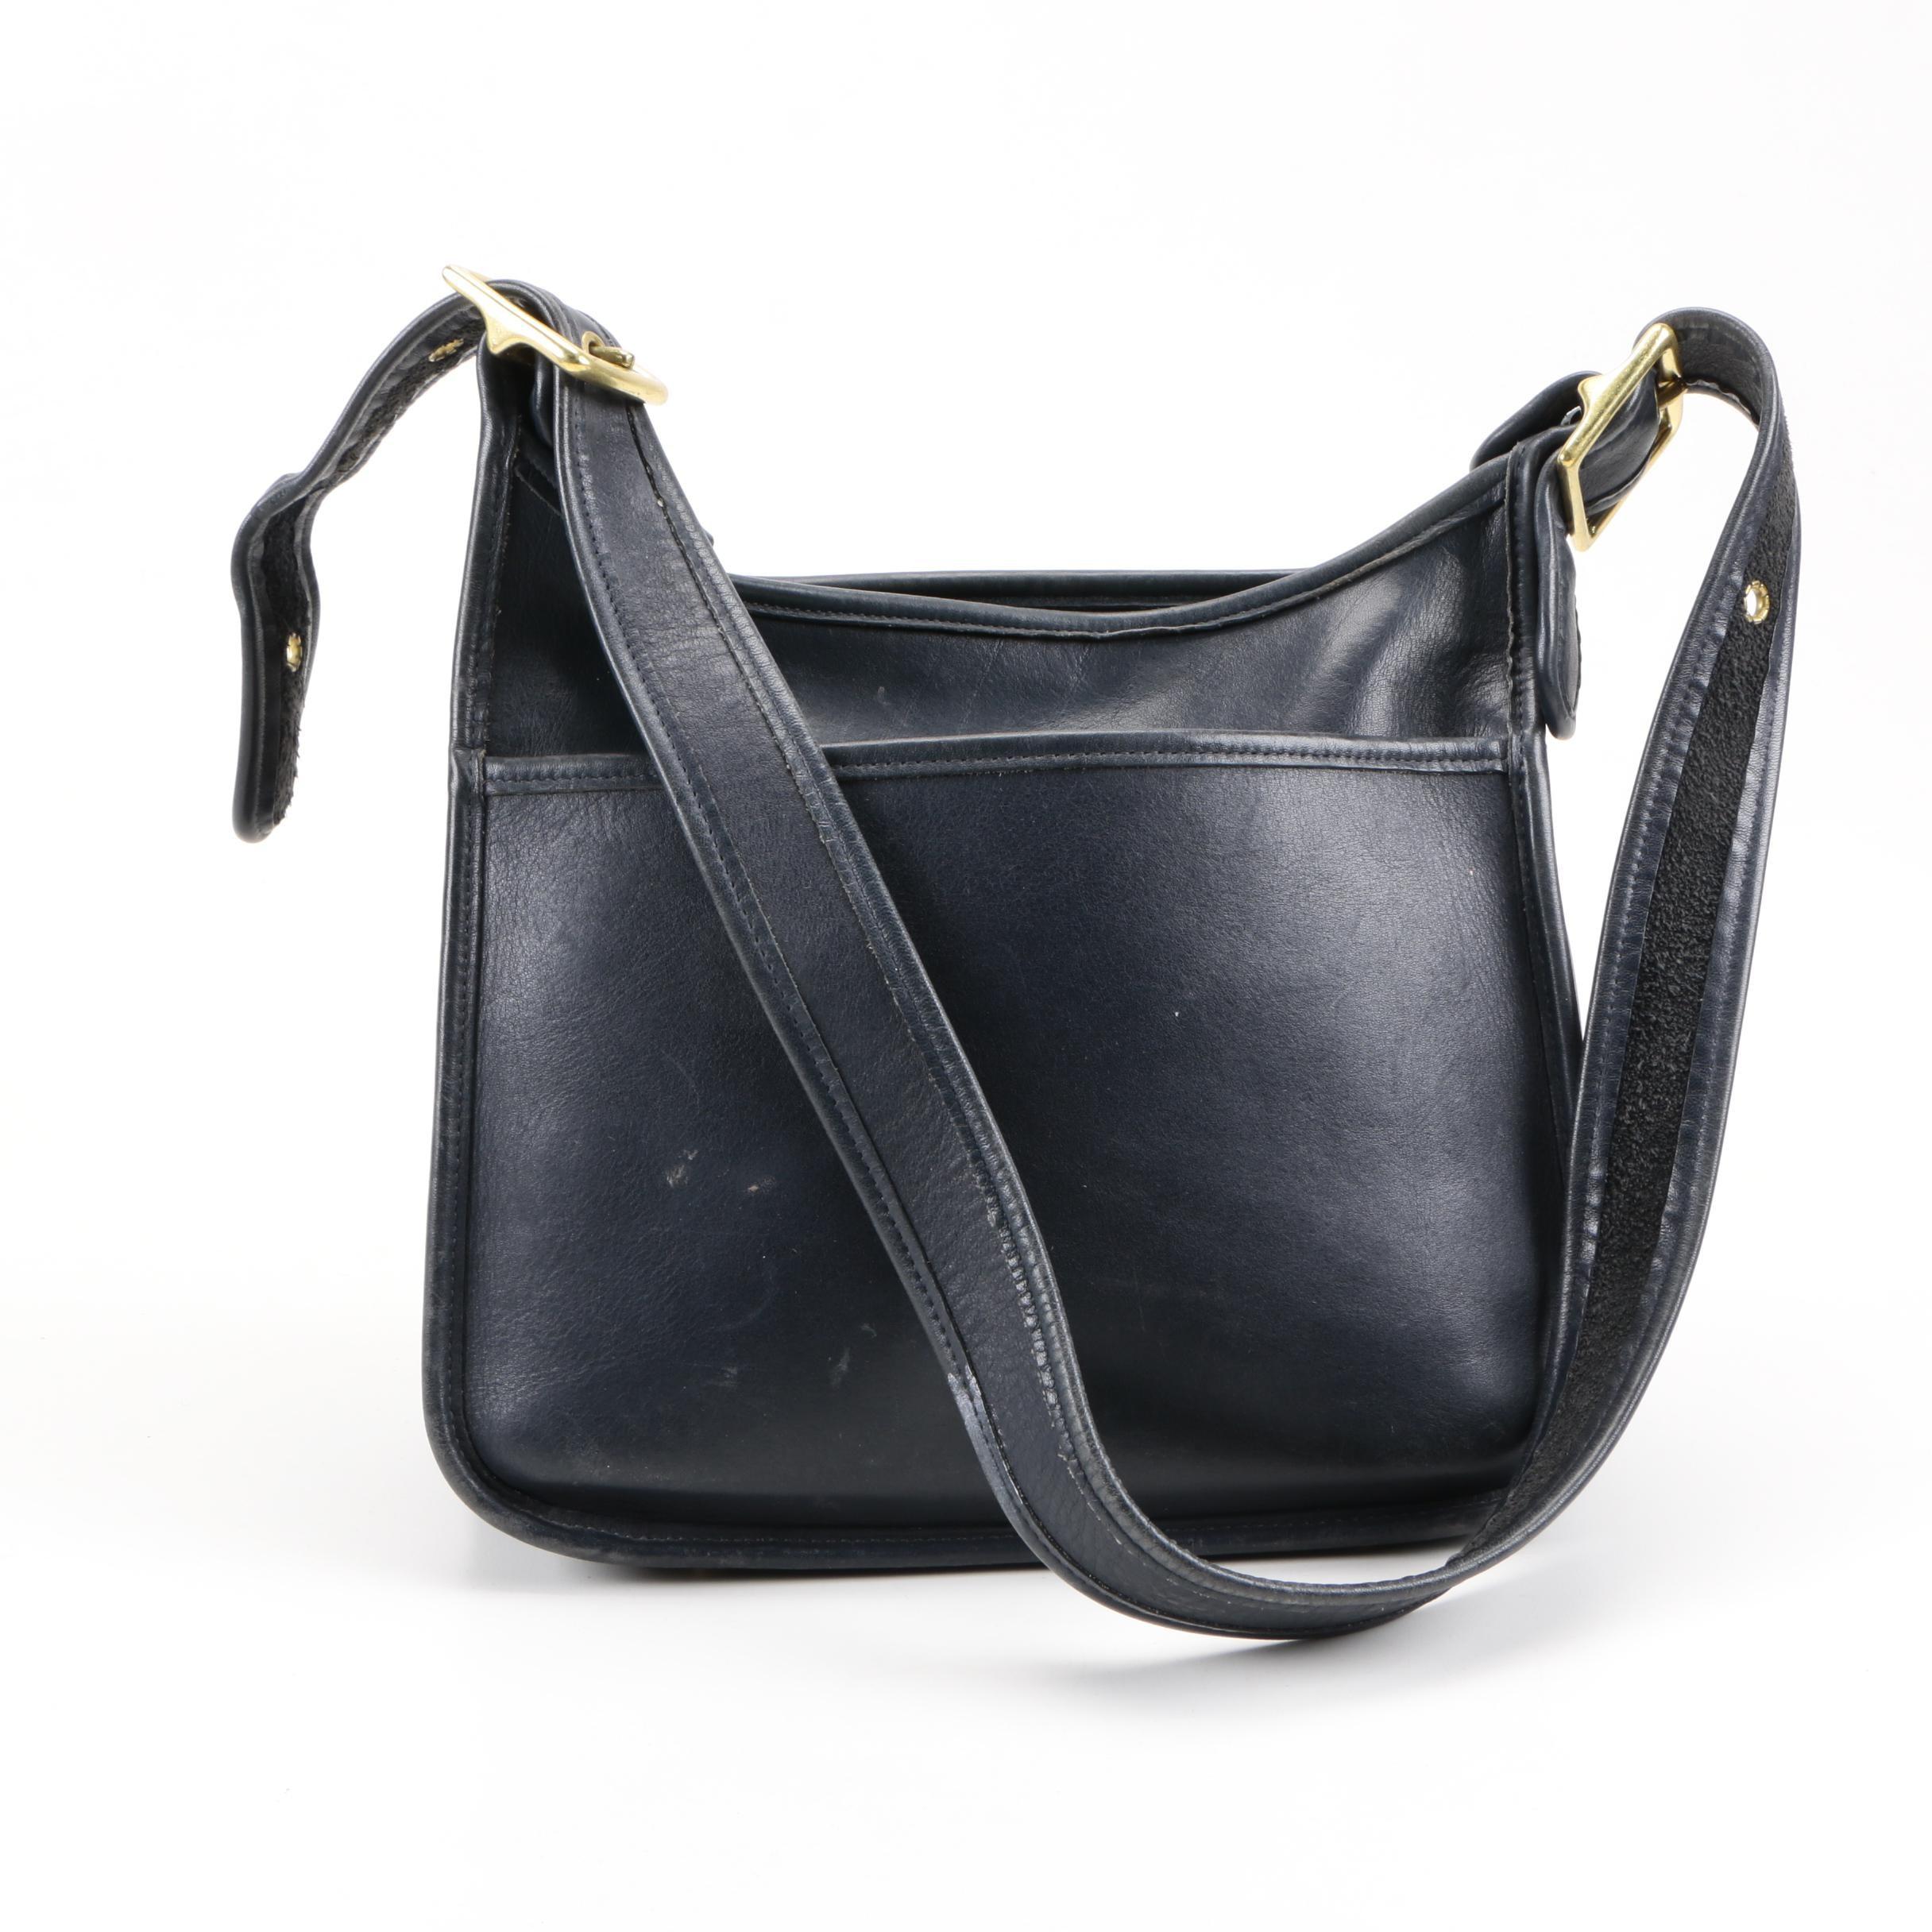 Vintage Coach Navy Blue Leather Legacy Handbag